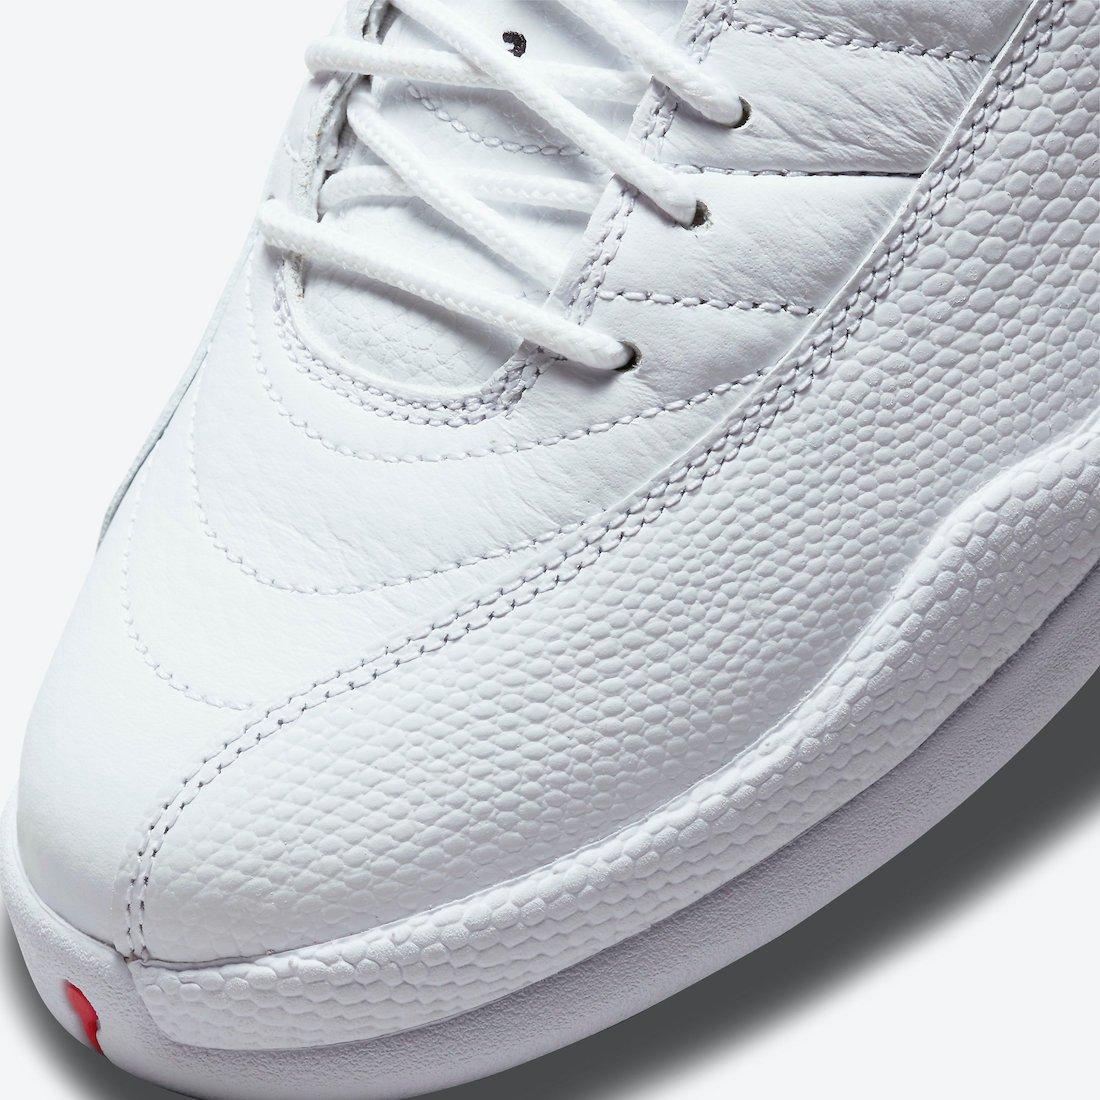 Air Jordan 12 Twist White University Red CT8013-106 Release Price